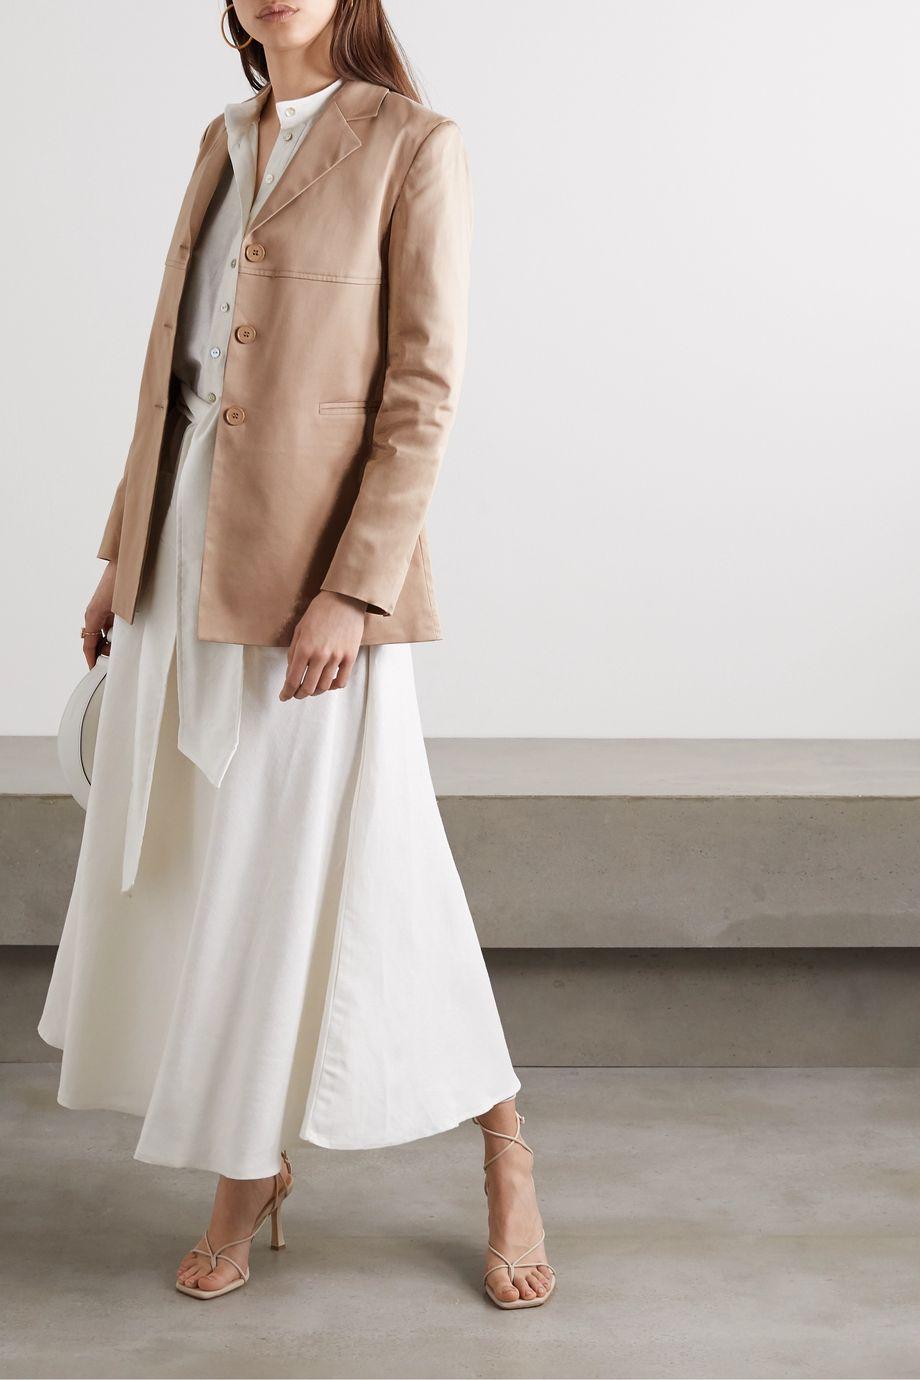 Àcheval Pampa Borges stretch-cotton satin jacket